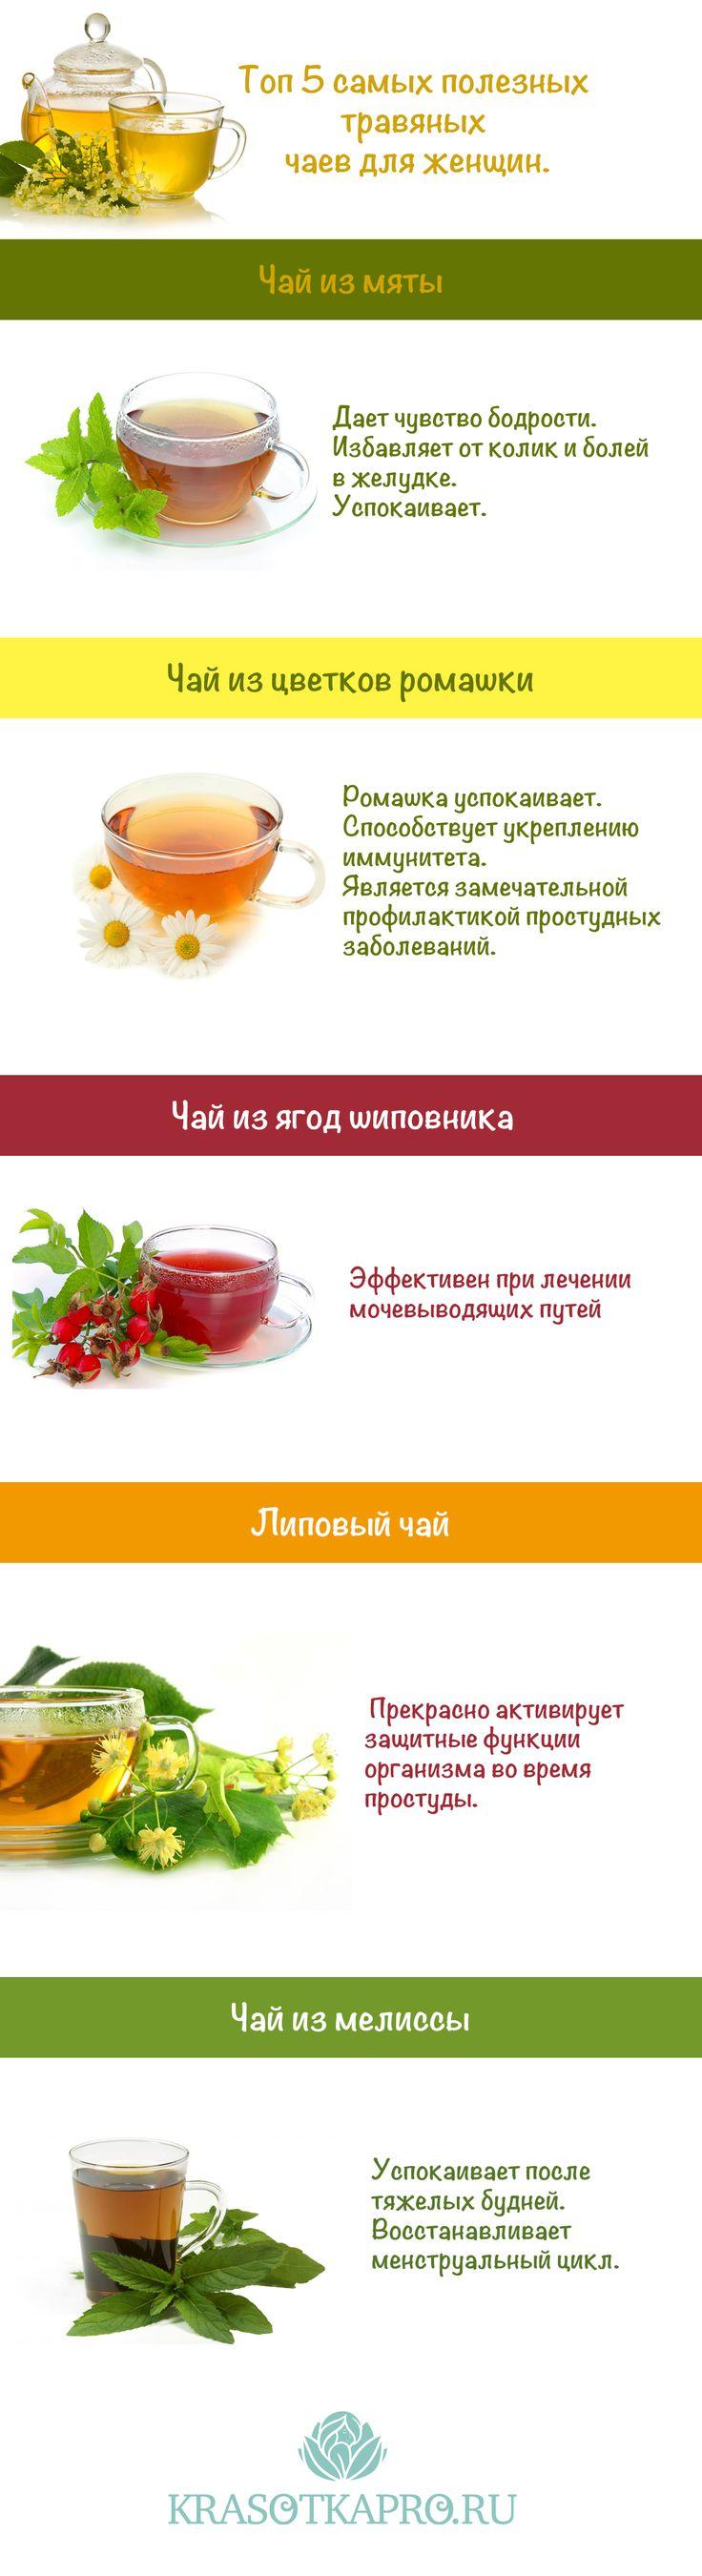 Топ 5 самых полезных травяных чаев для женщин  by KrasotkaPro  #KrasotkaPro #herbal #tea #mint #camomile #КрасоткаПро #травянойчай #чай